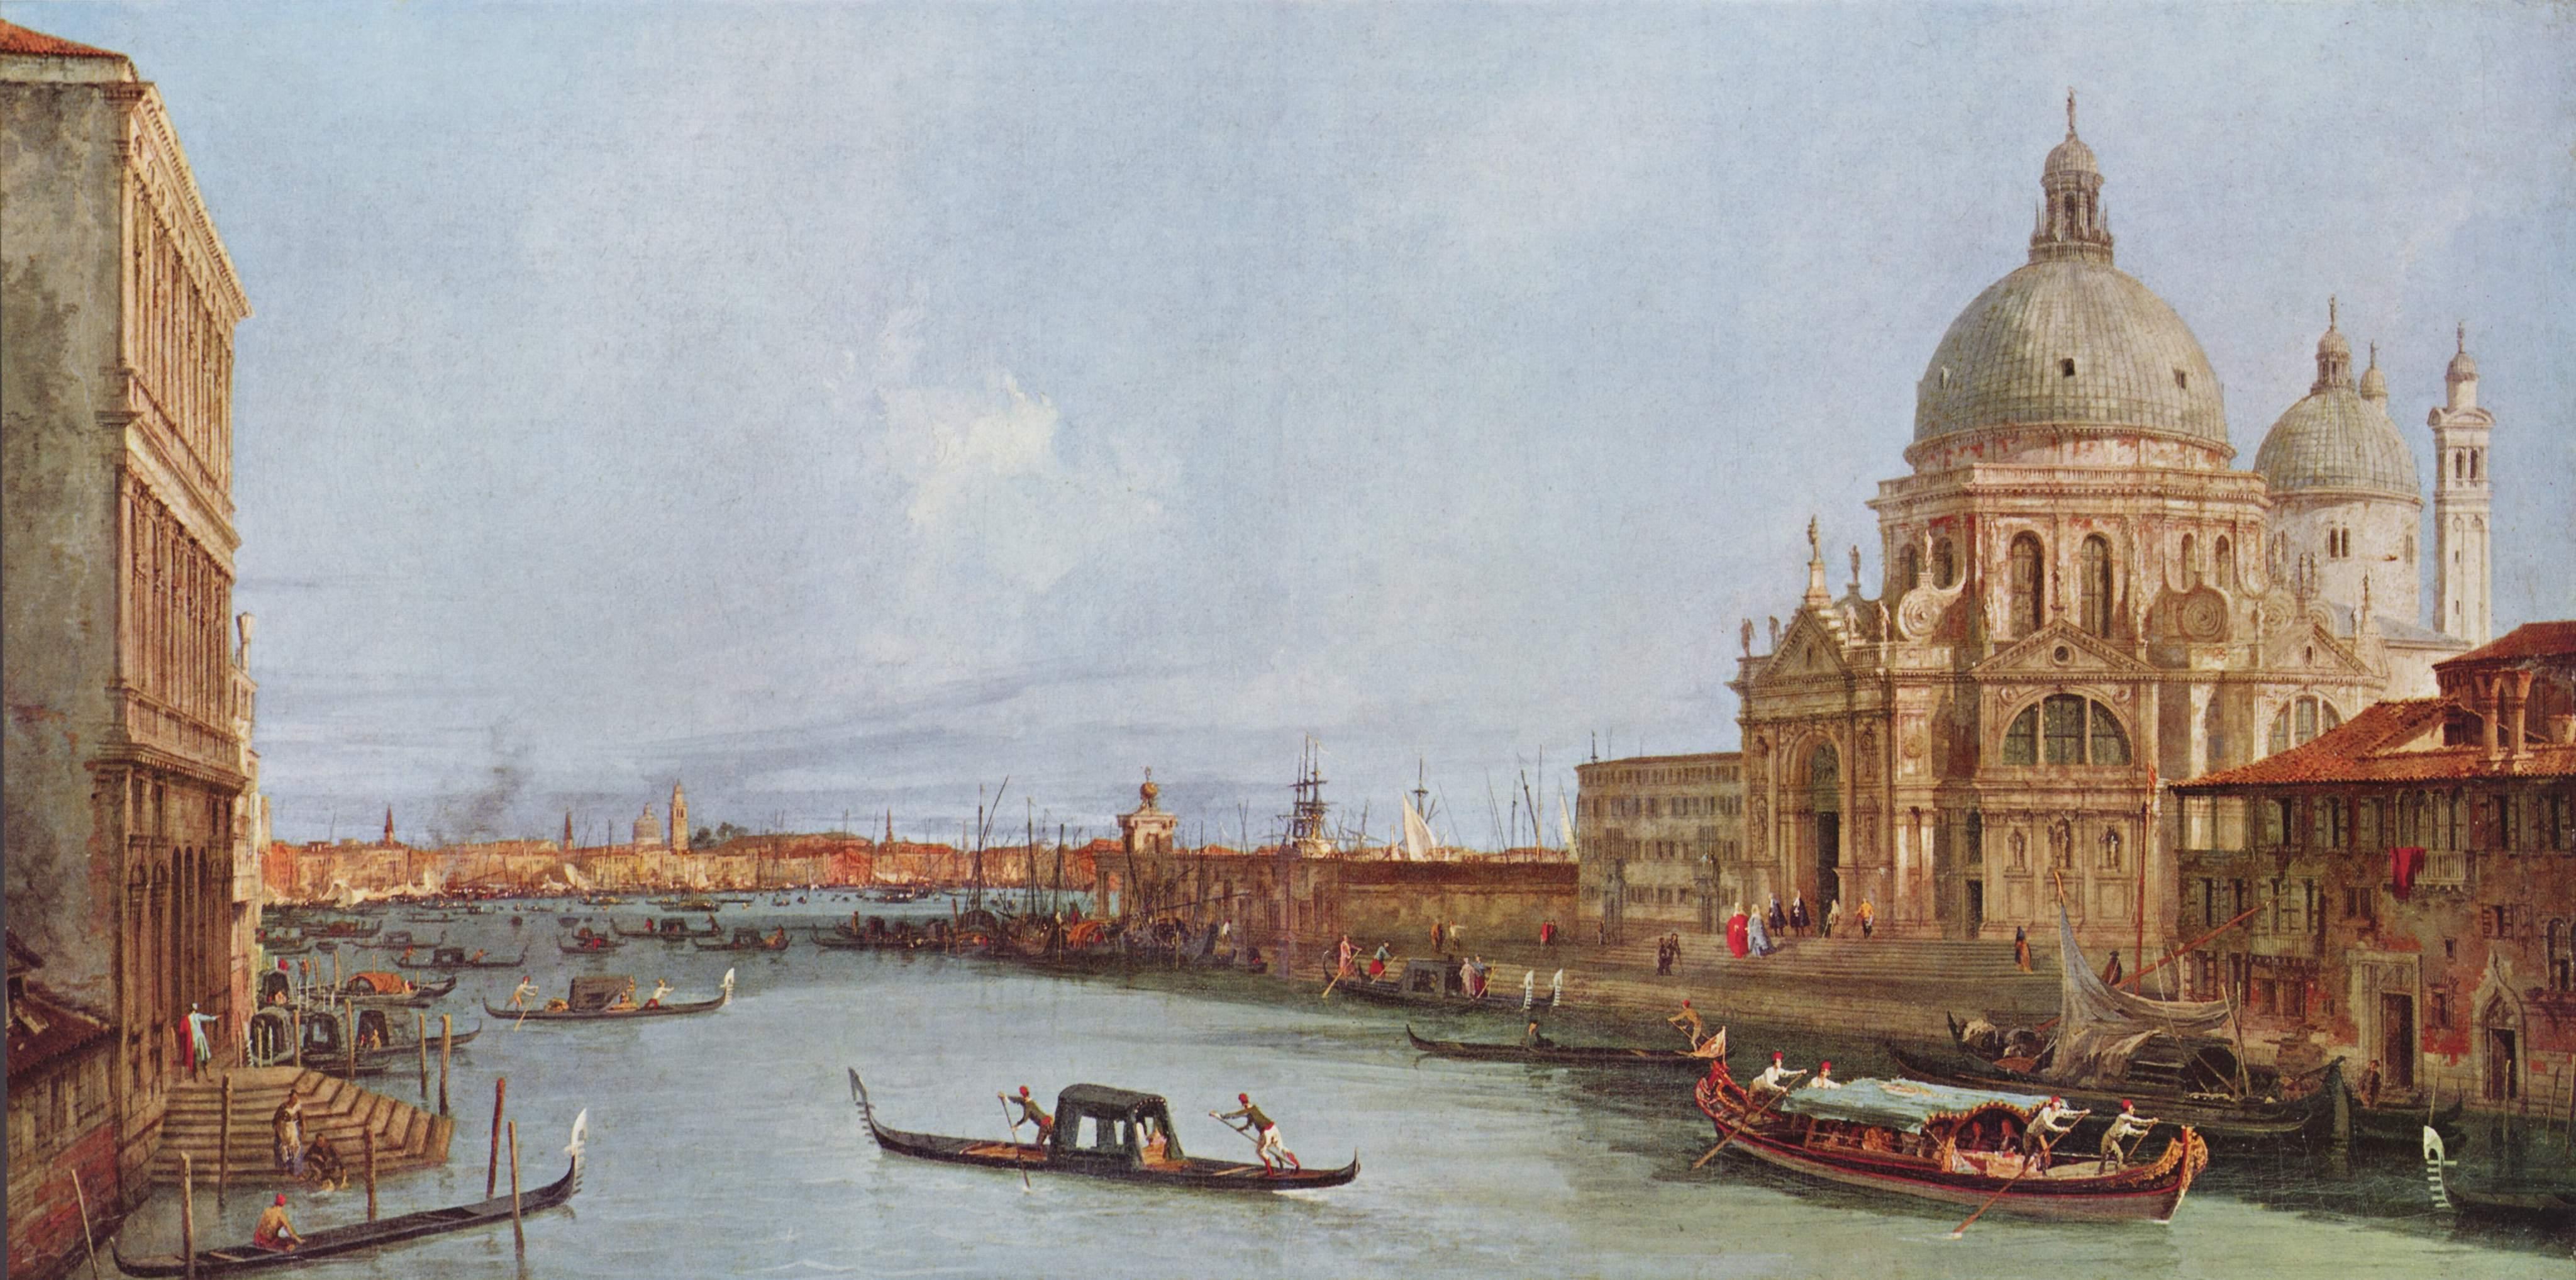 http://upload.wikimedia.org/wikipedia/commons/3/38/Canaletto_%28II%29_028.jpg